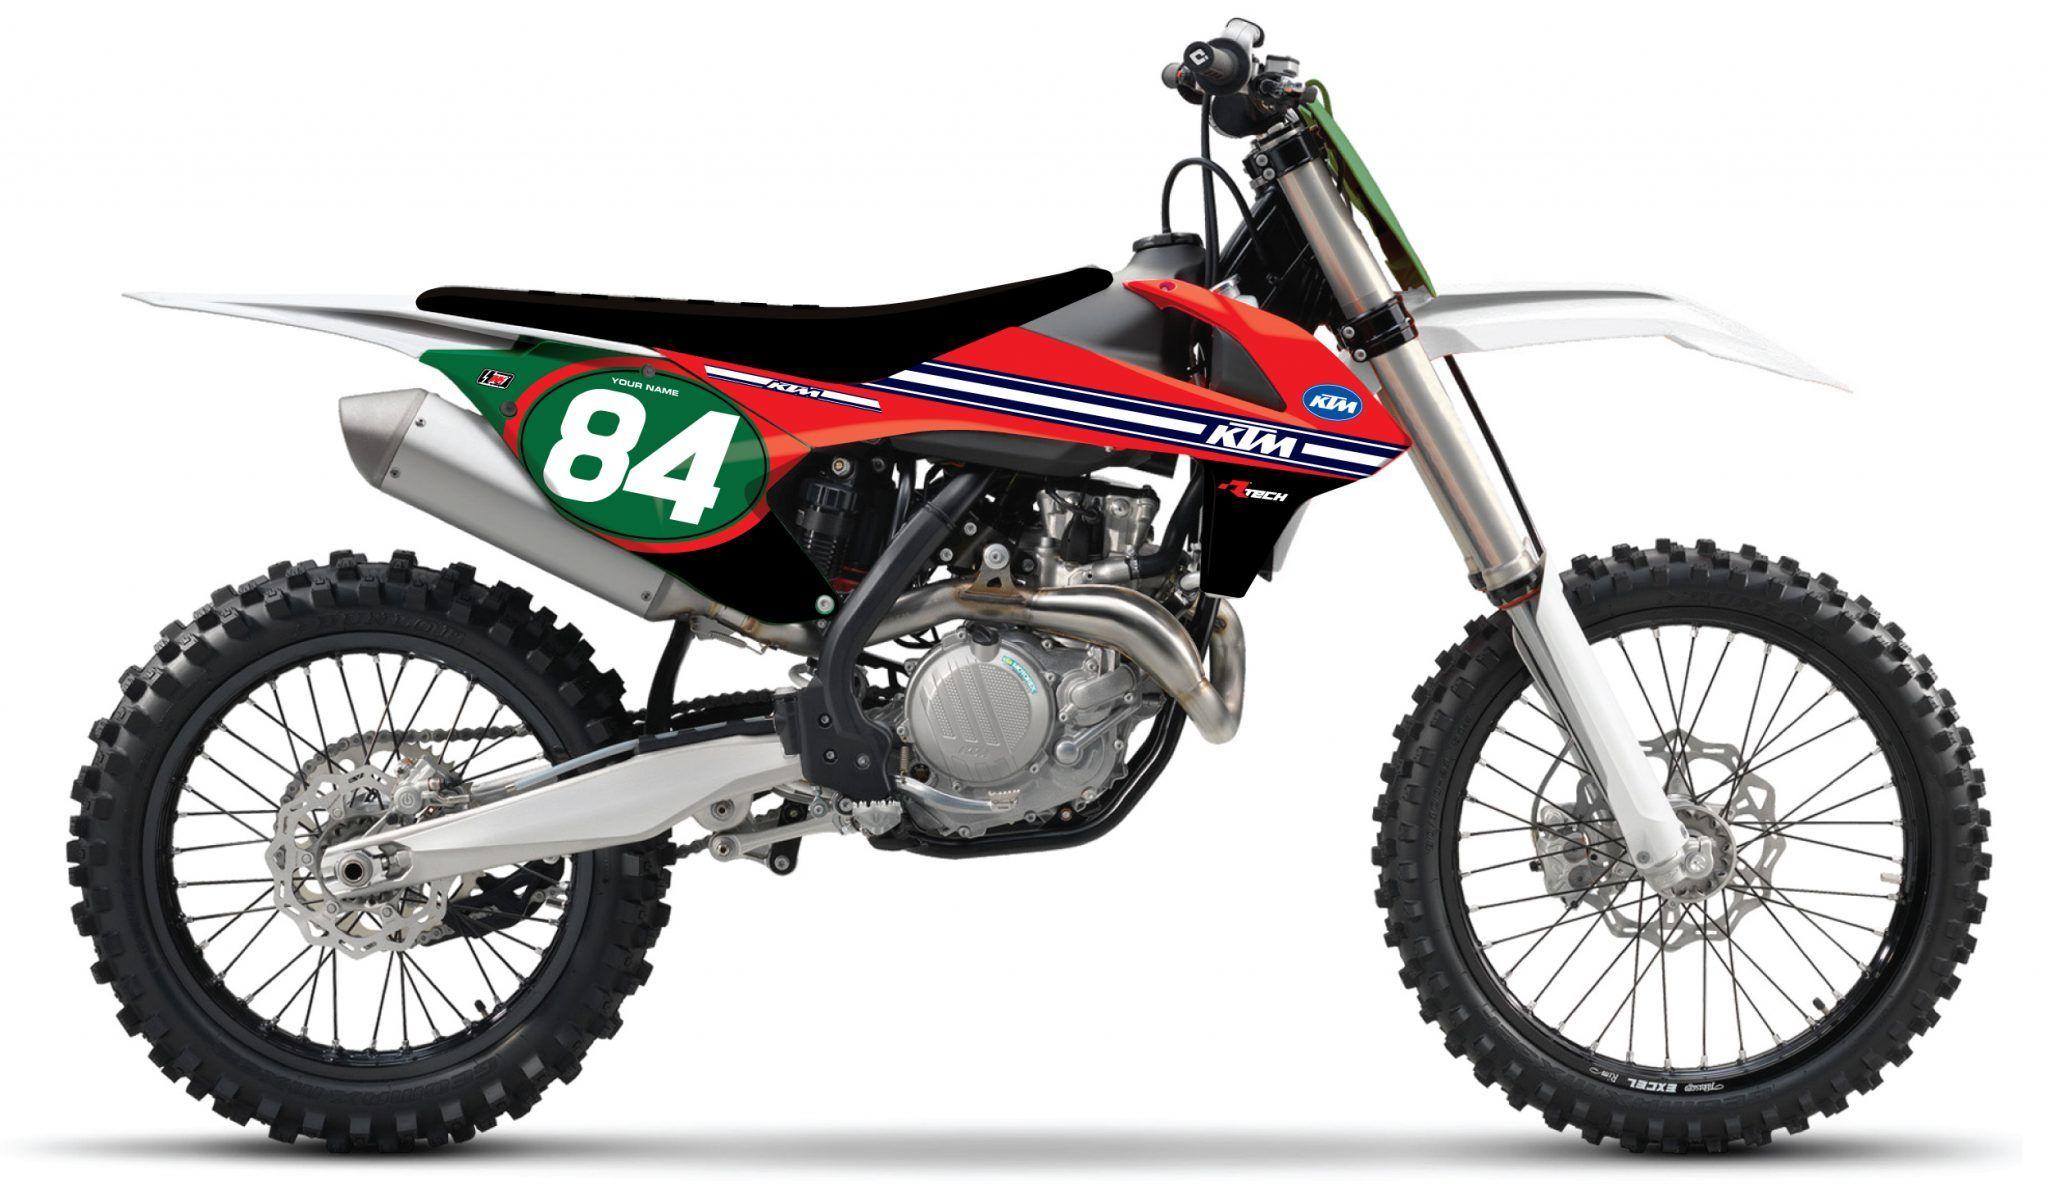 Vintage motocross number plate graphics - Shop